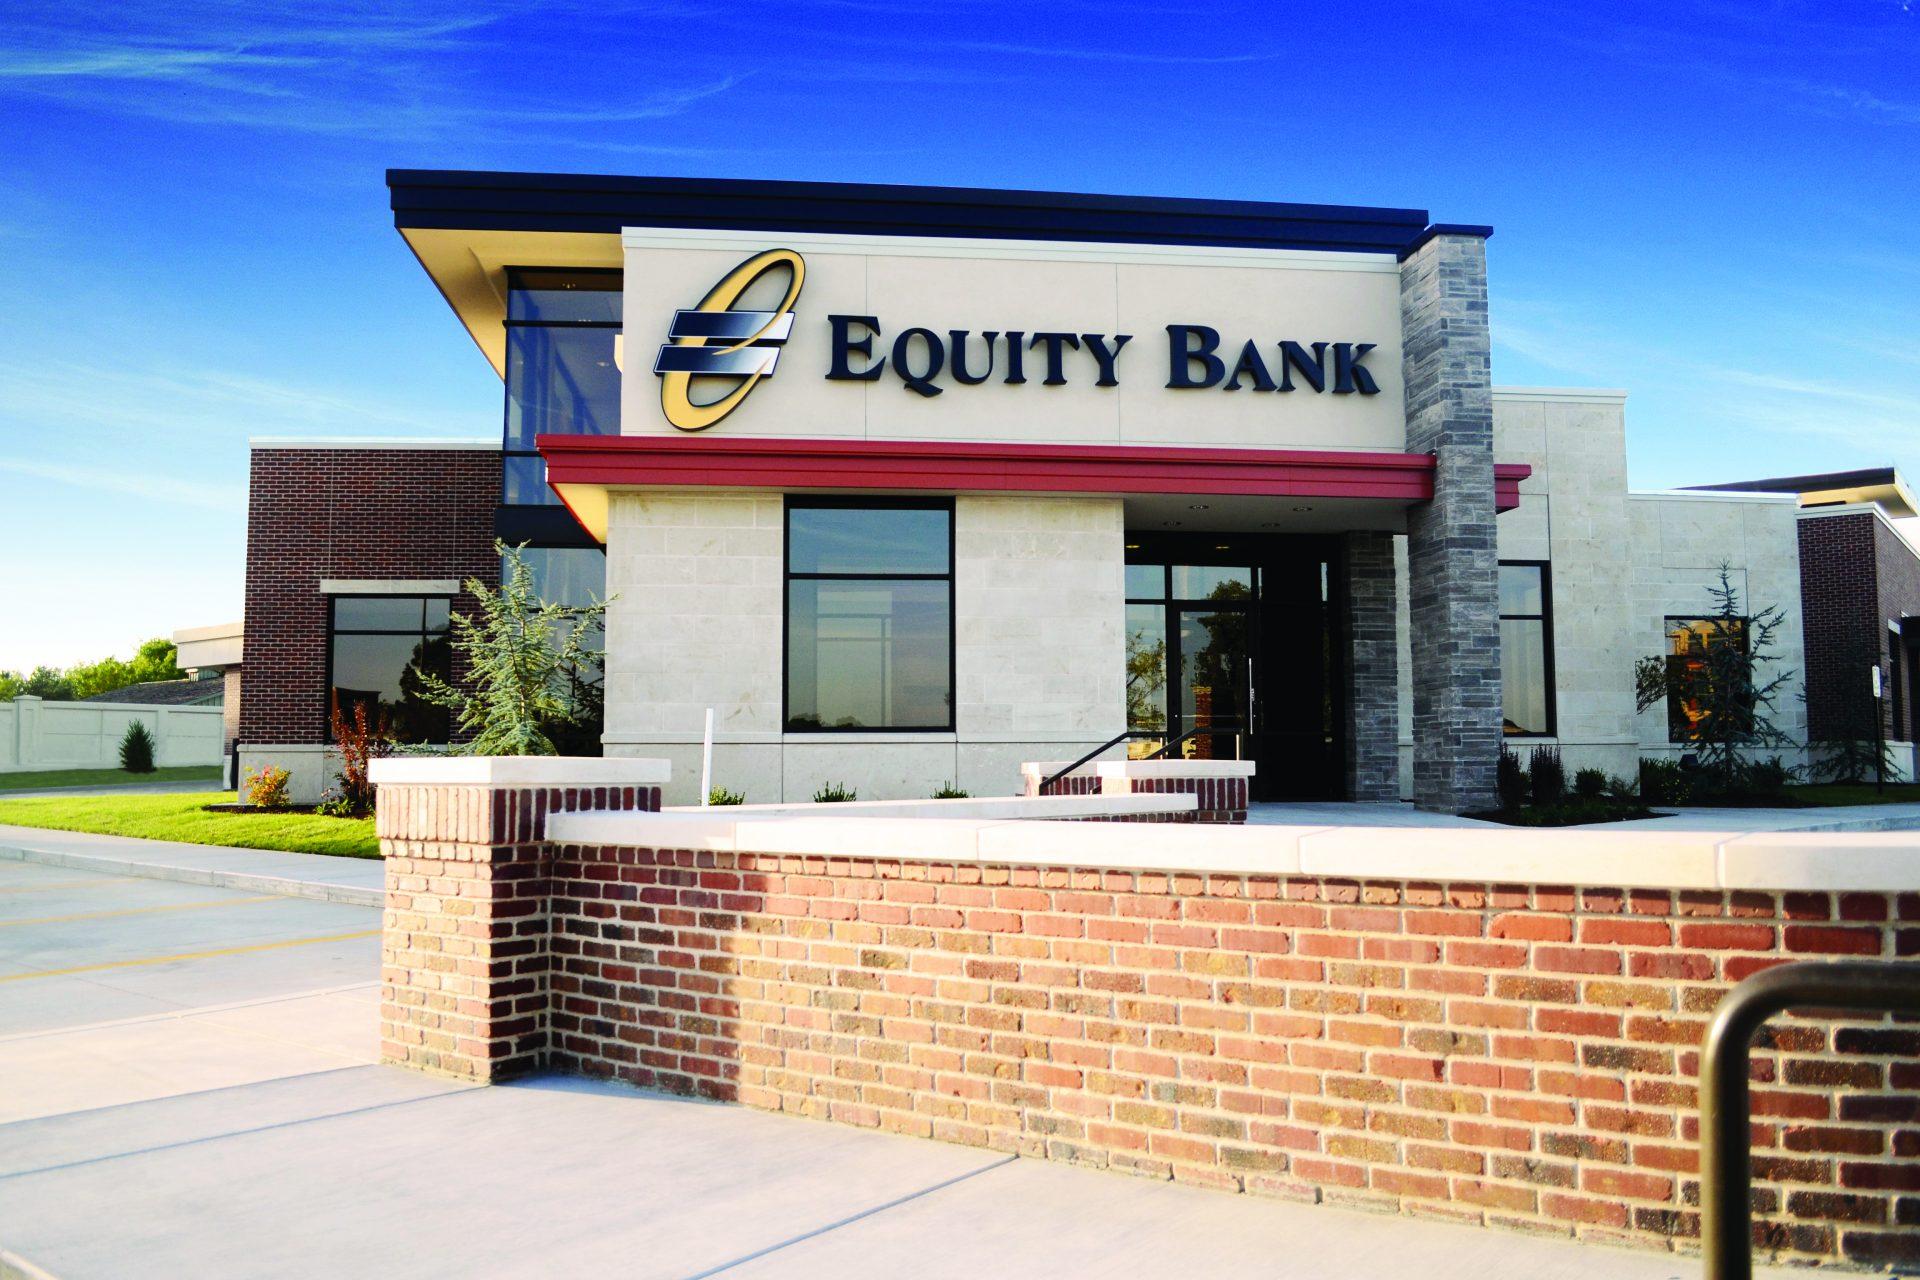 Equity Bank Wichita Webb Road branch exterior.